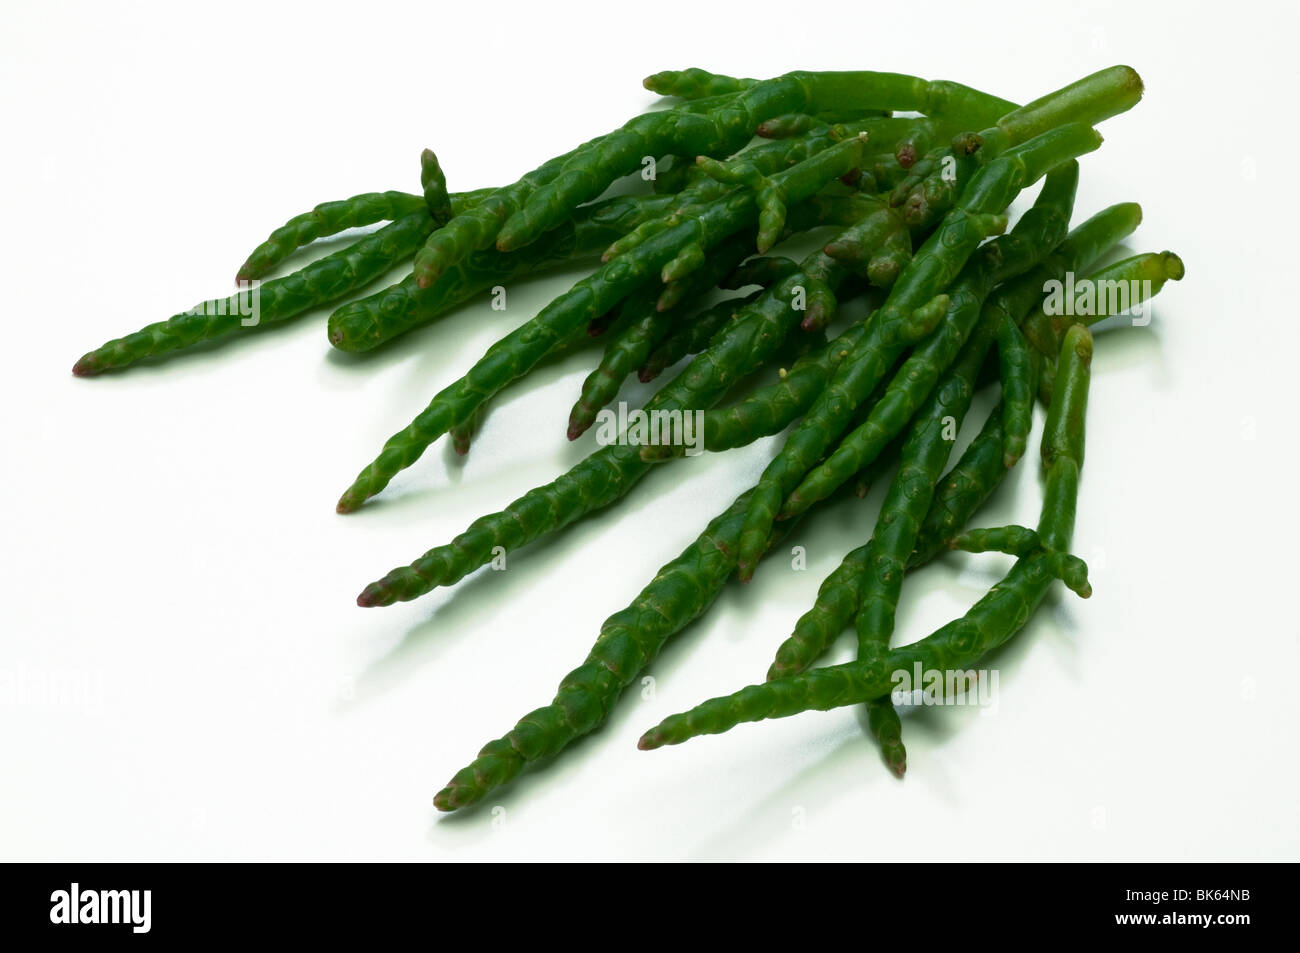 Common Glasswort, Salicorn (Salicornia europaea), green